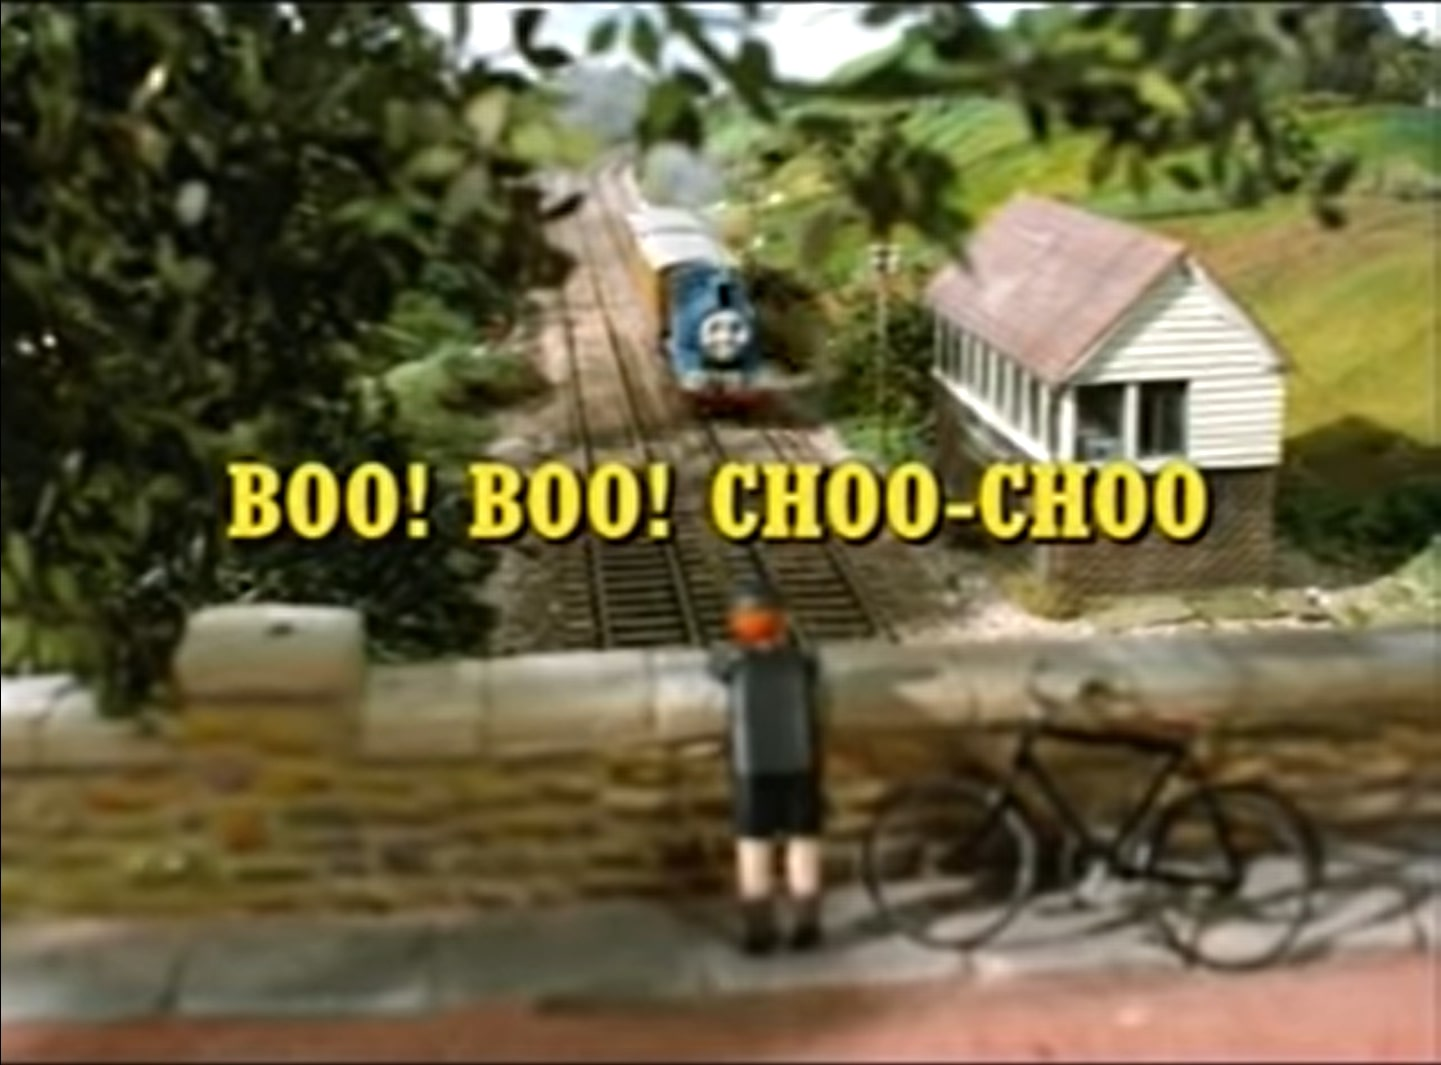 File:BooBooChooChootitlecard2.jpg